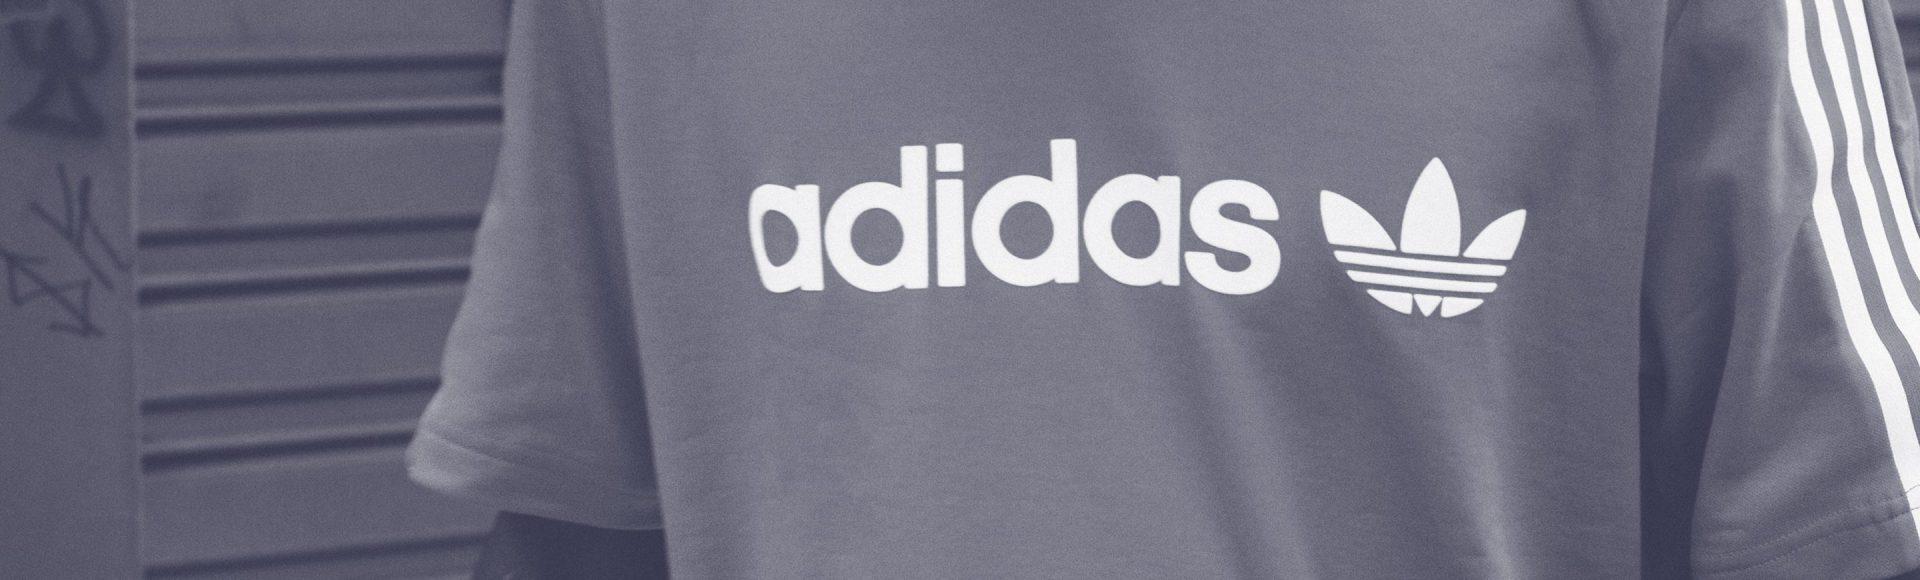 ARK-Invest_Blog-Banner_2014_05_01---Adidas